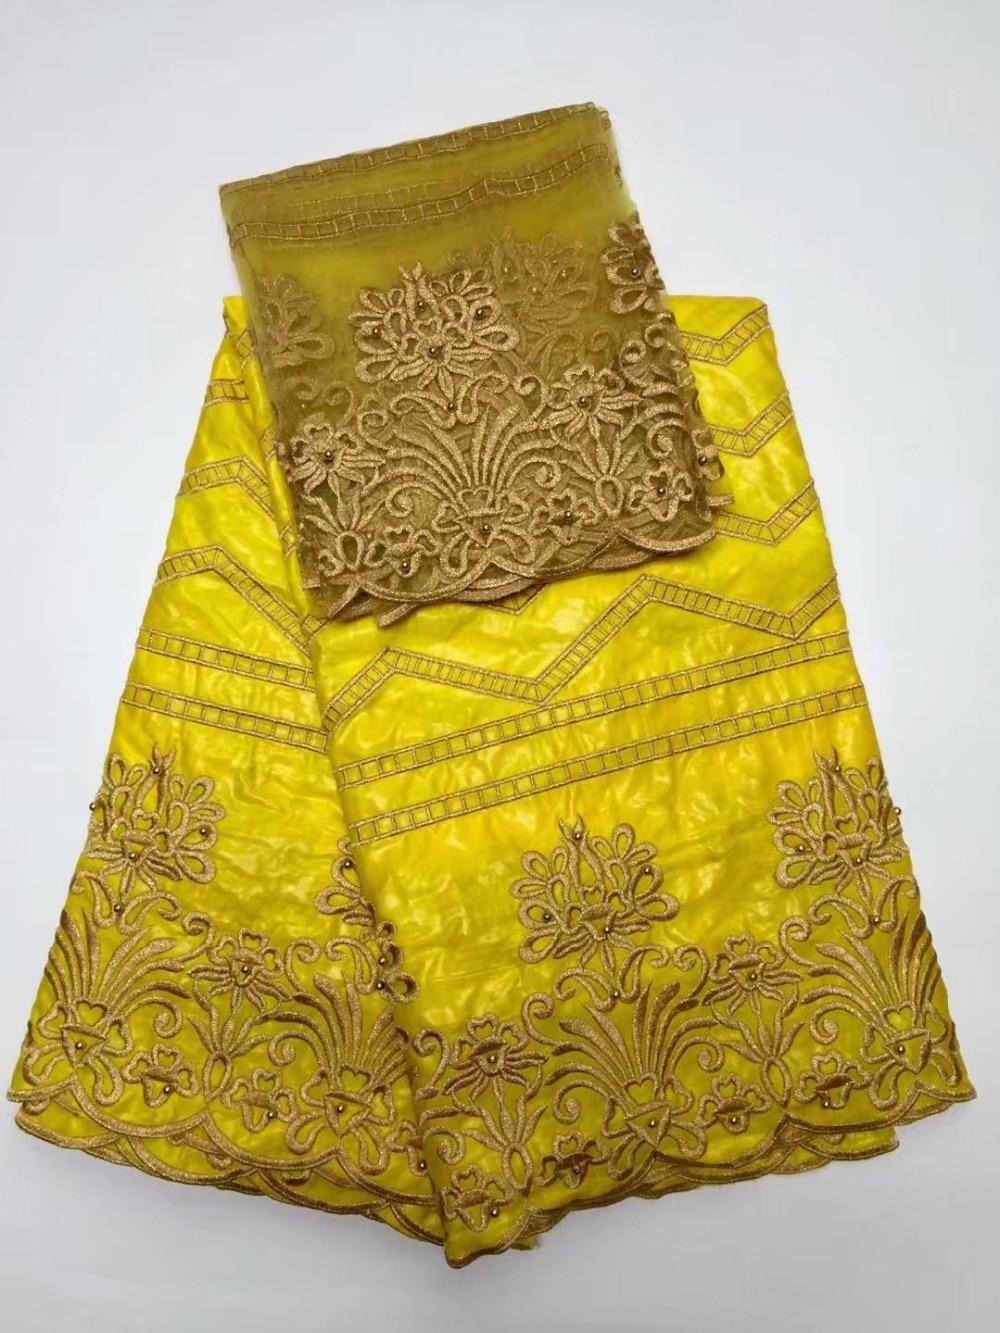 Yellow lace embroidered fabric bazin riche nigerian